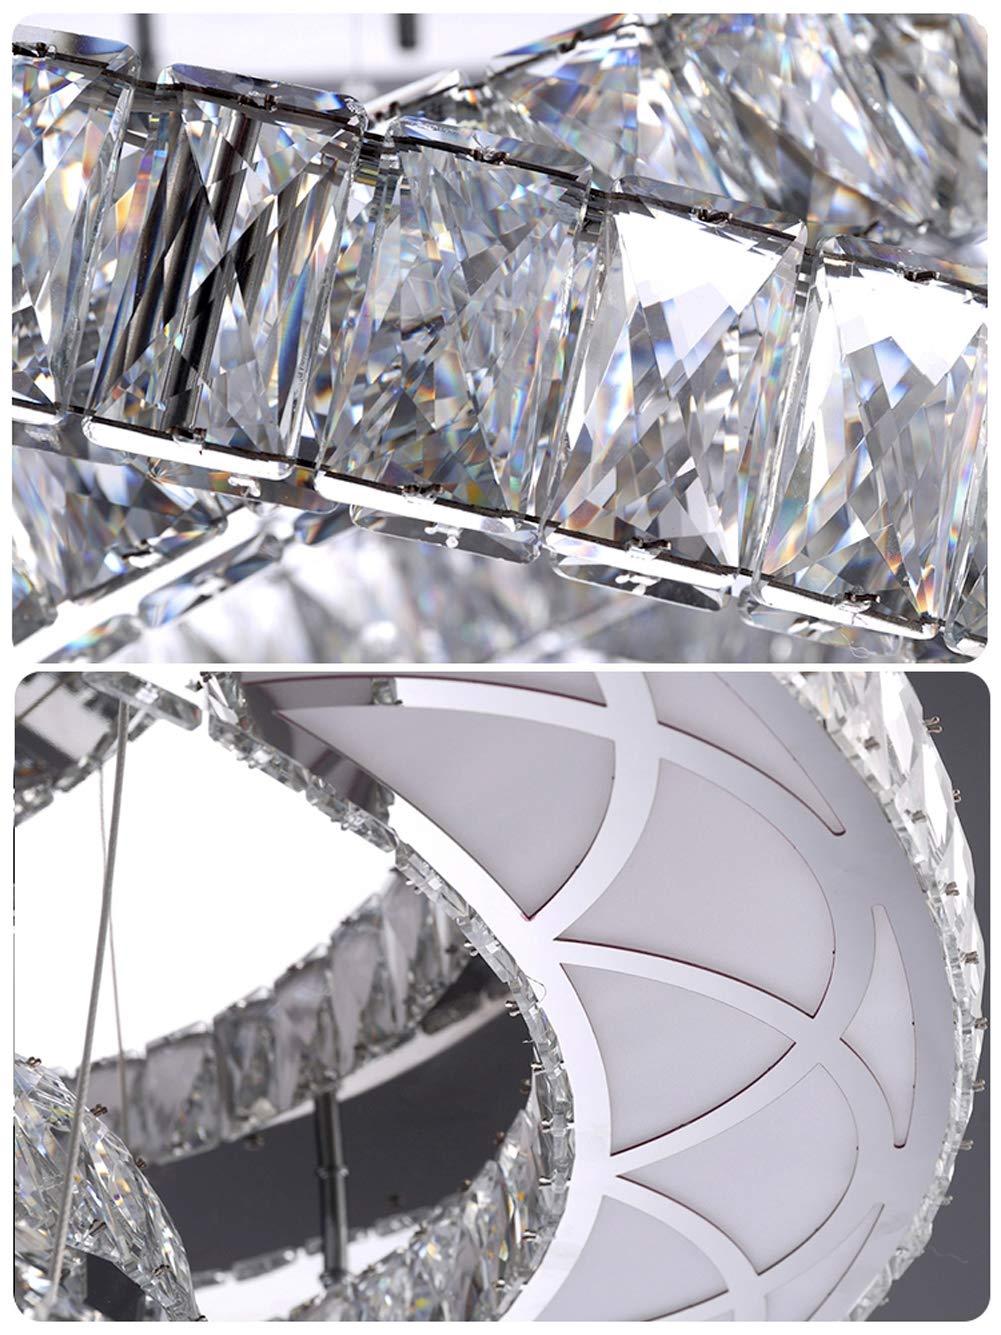 L/ámpara De Ara/ña Con Anillo De Cristal LED 3 Llamas L/ámpara De Techo L/ámpara De Luz Regulable Con Control Remoto L/ámpara De Sala De Estar Moderna L/ámpara De Restaurante Acero Inoxidable /Ø60cm H30CM